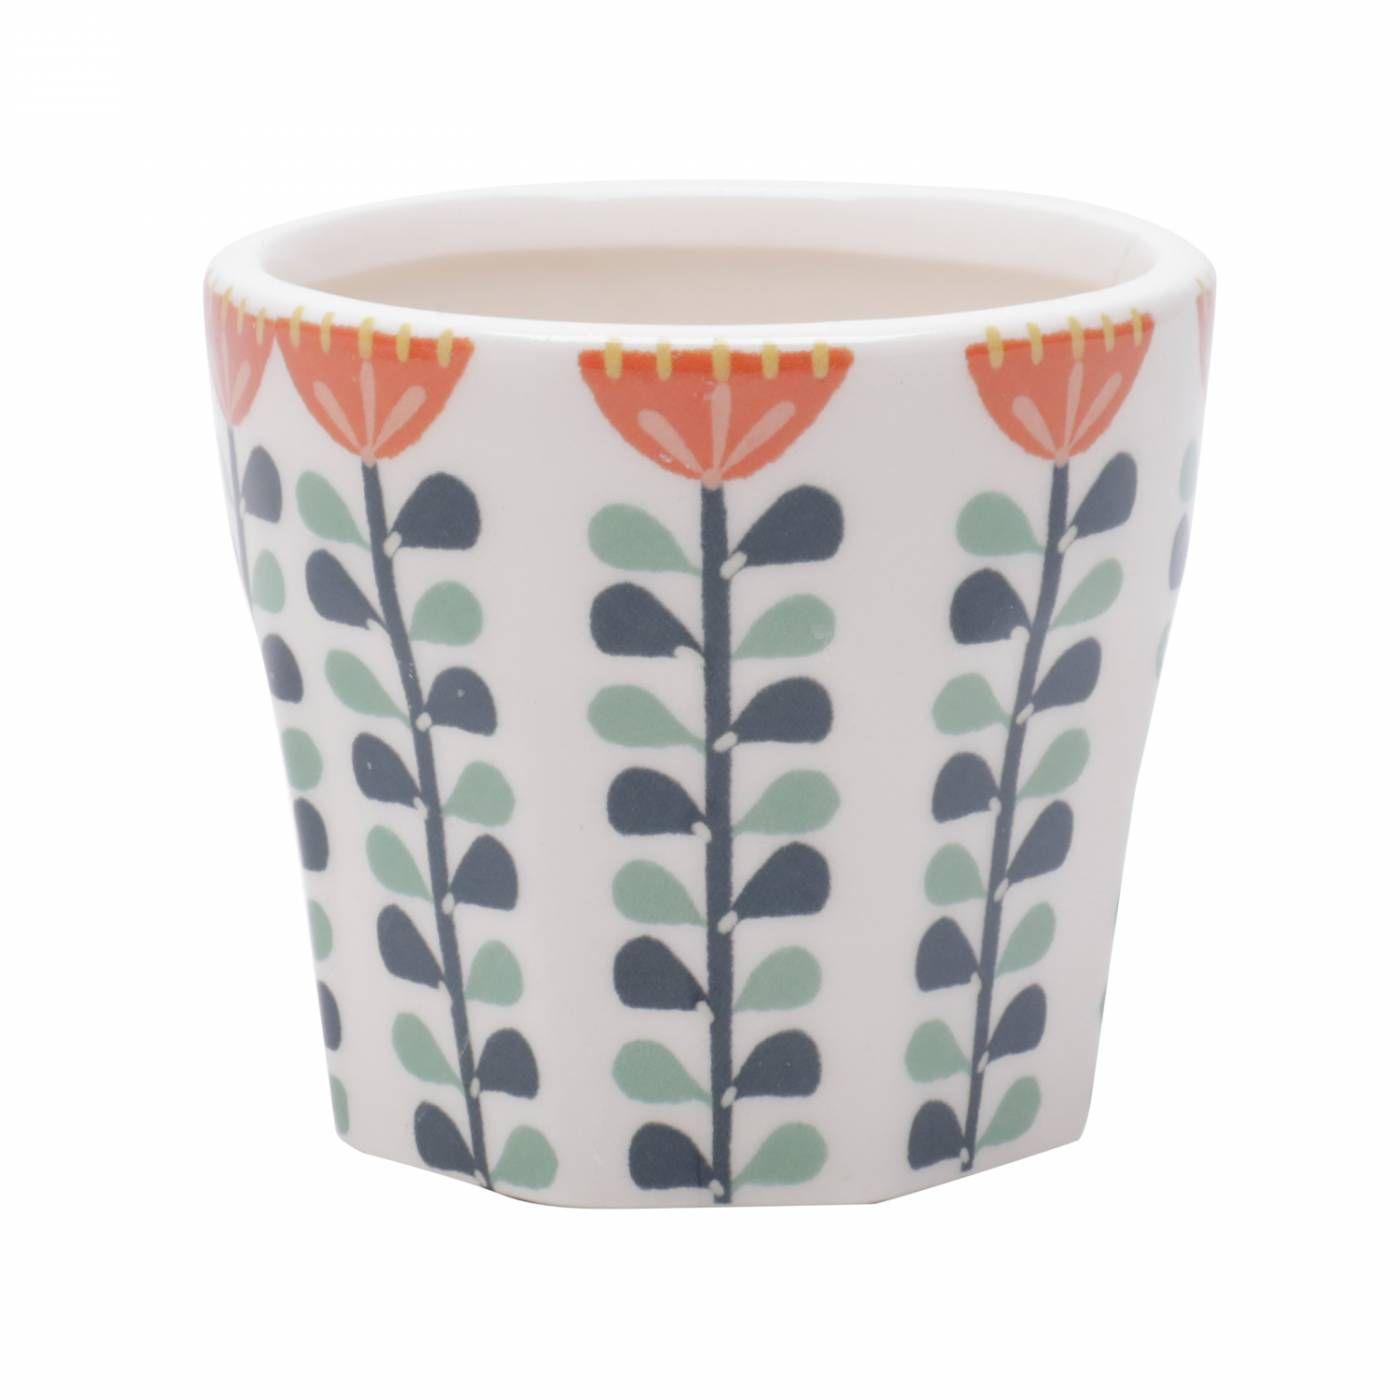 Vaso em Cerâmica Scandinavian Flowers Branco Pequeno 8,5x8,5x7,5 cm